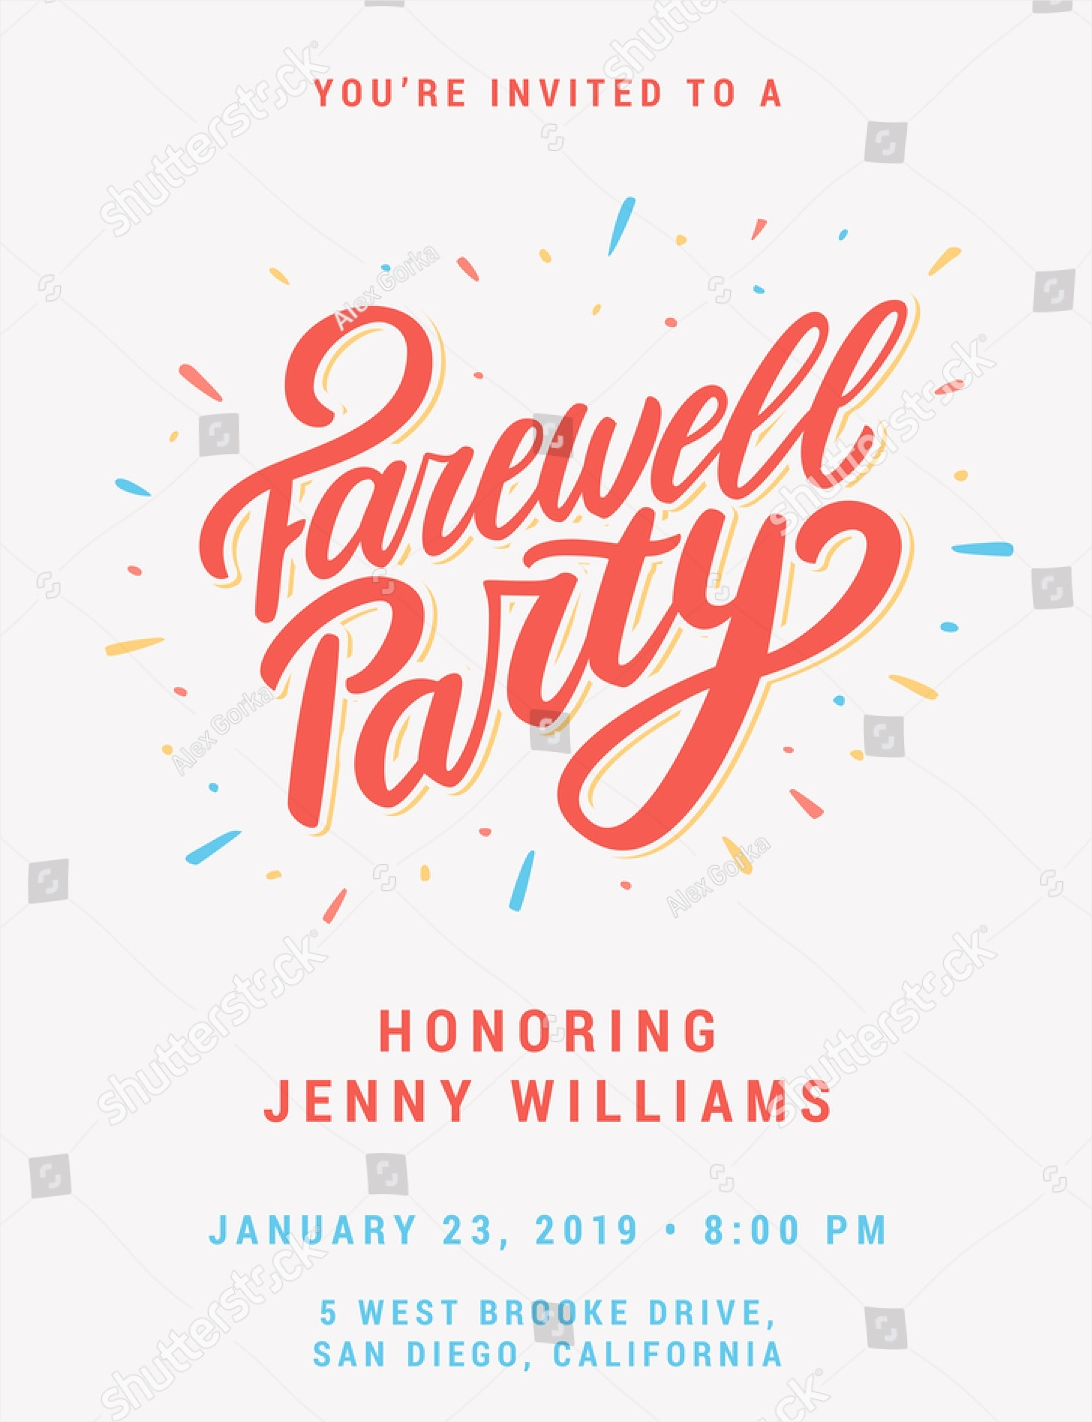 event farewell party invitation